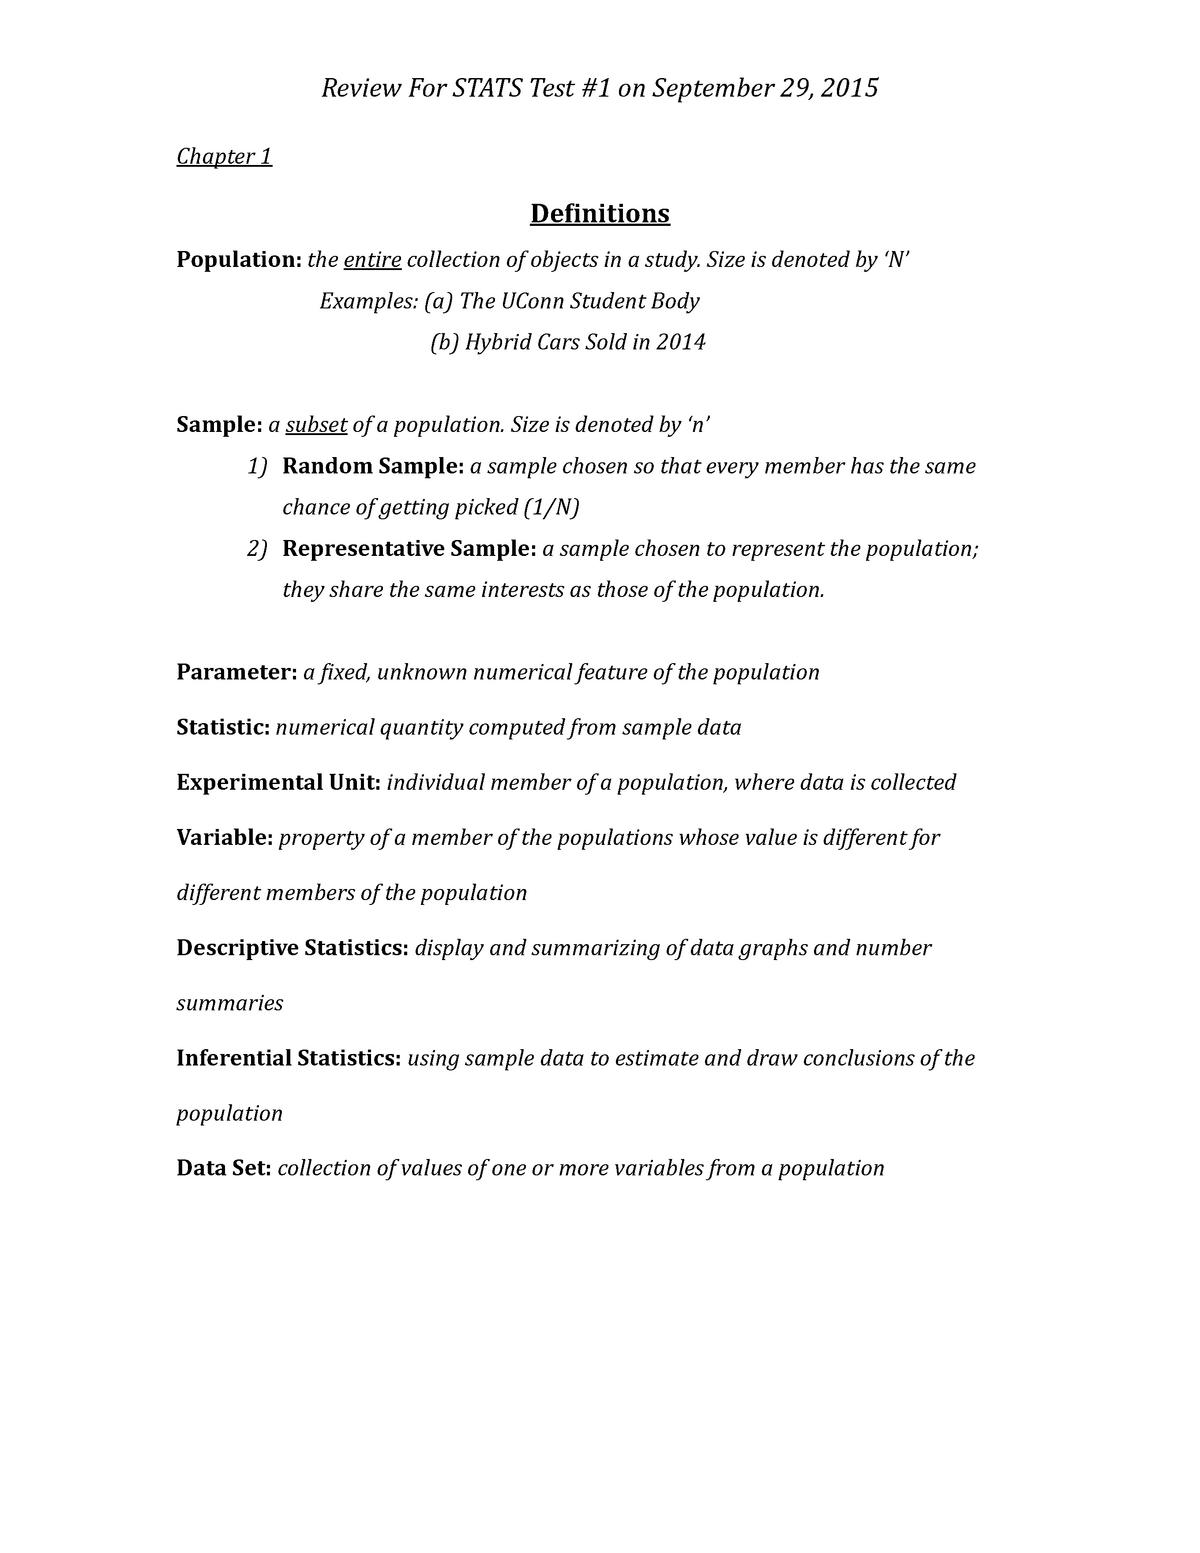 Summary STAT 1100Q STAT 1100Q 19 Oct 2018 - StuDocu